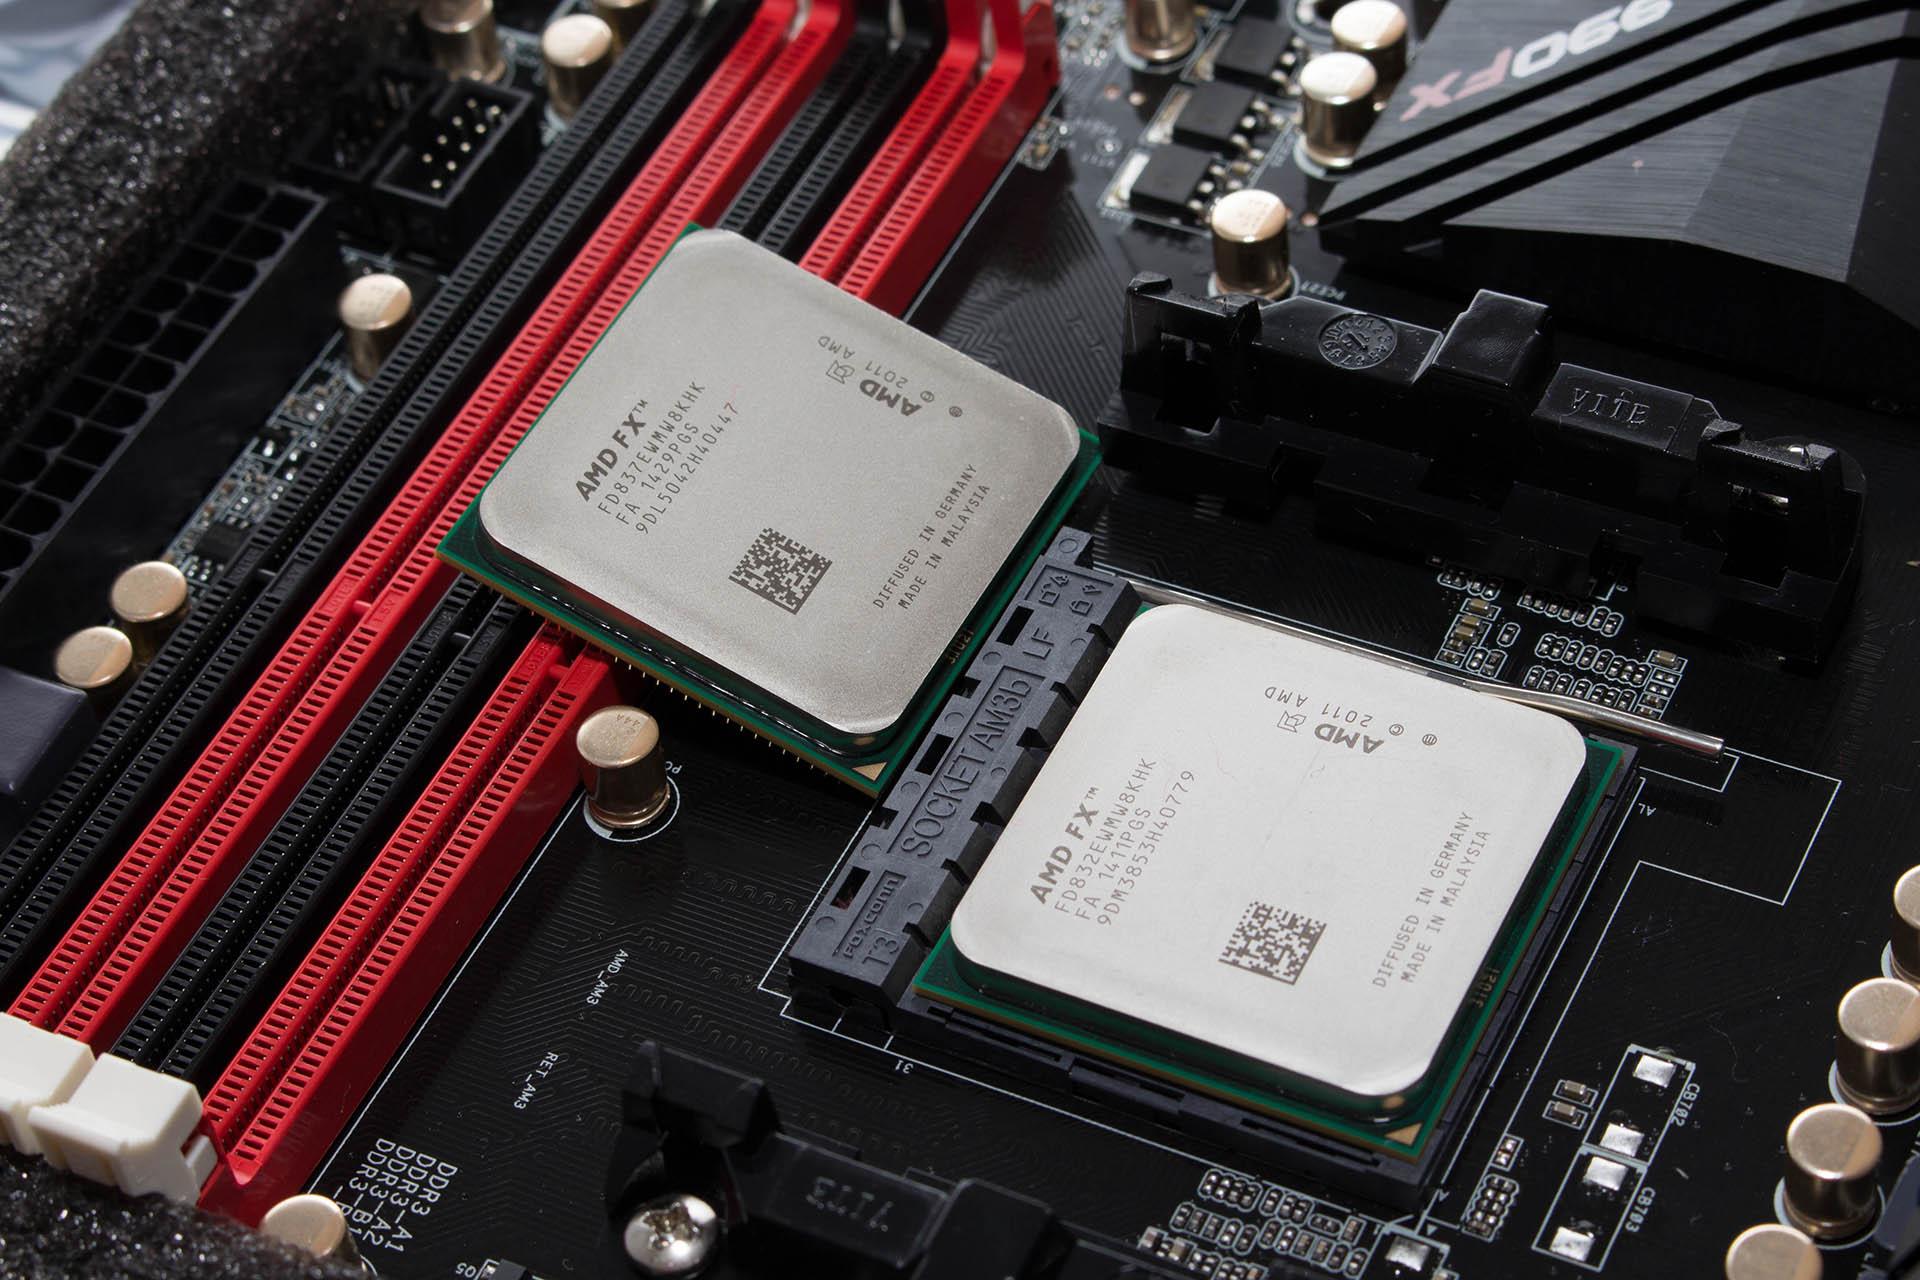 AMD FX-8370e, FX-8320e & ASRock Fatal1ty 990FX Killer